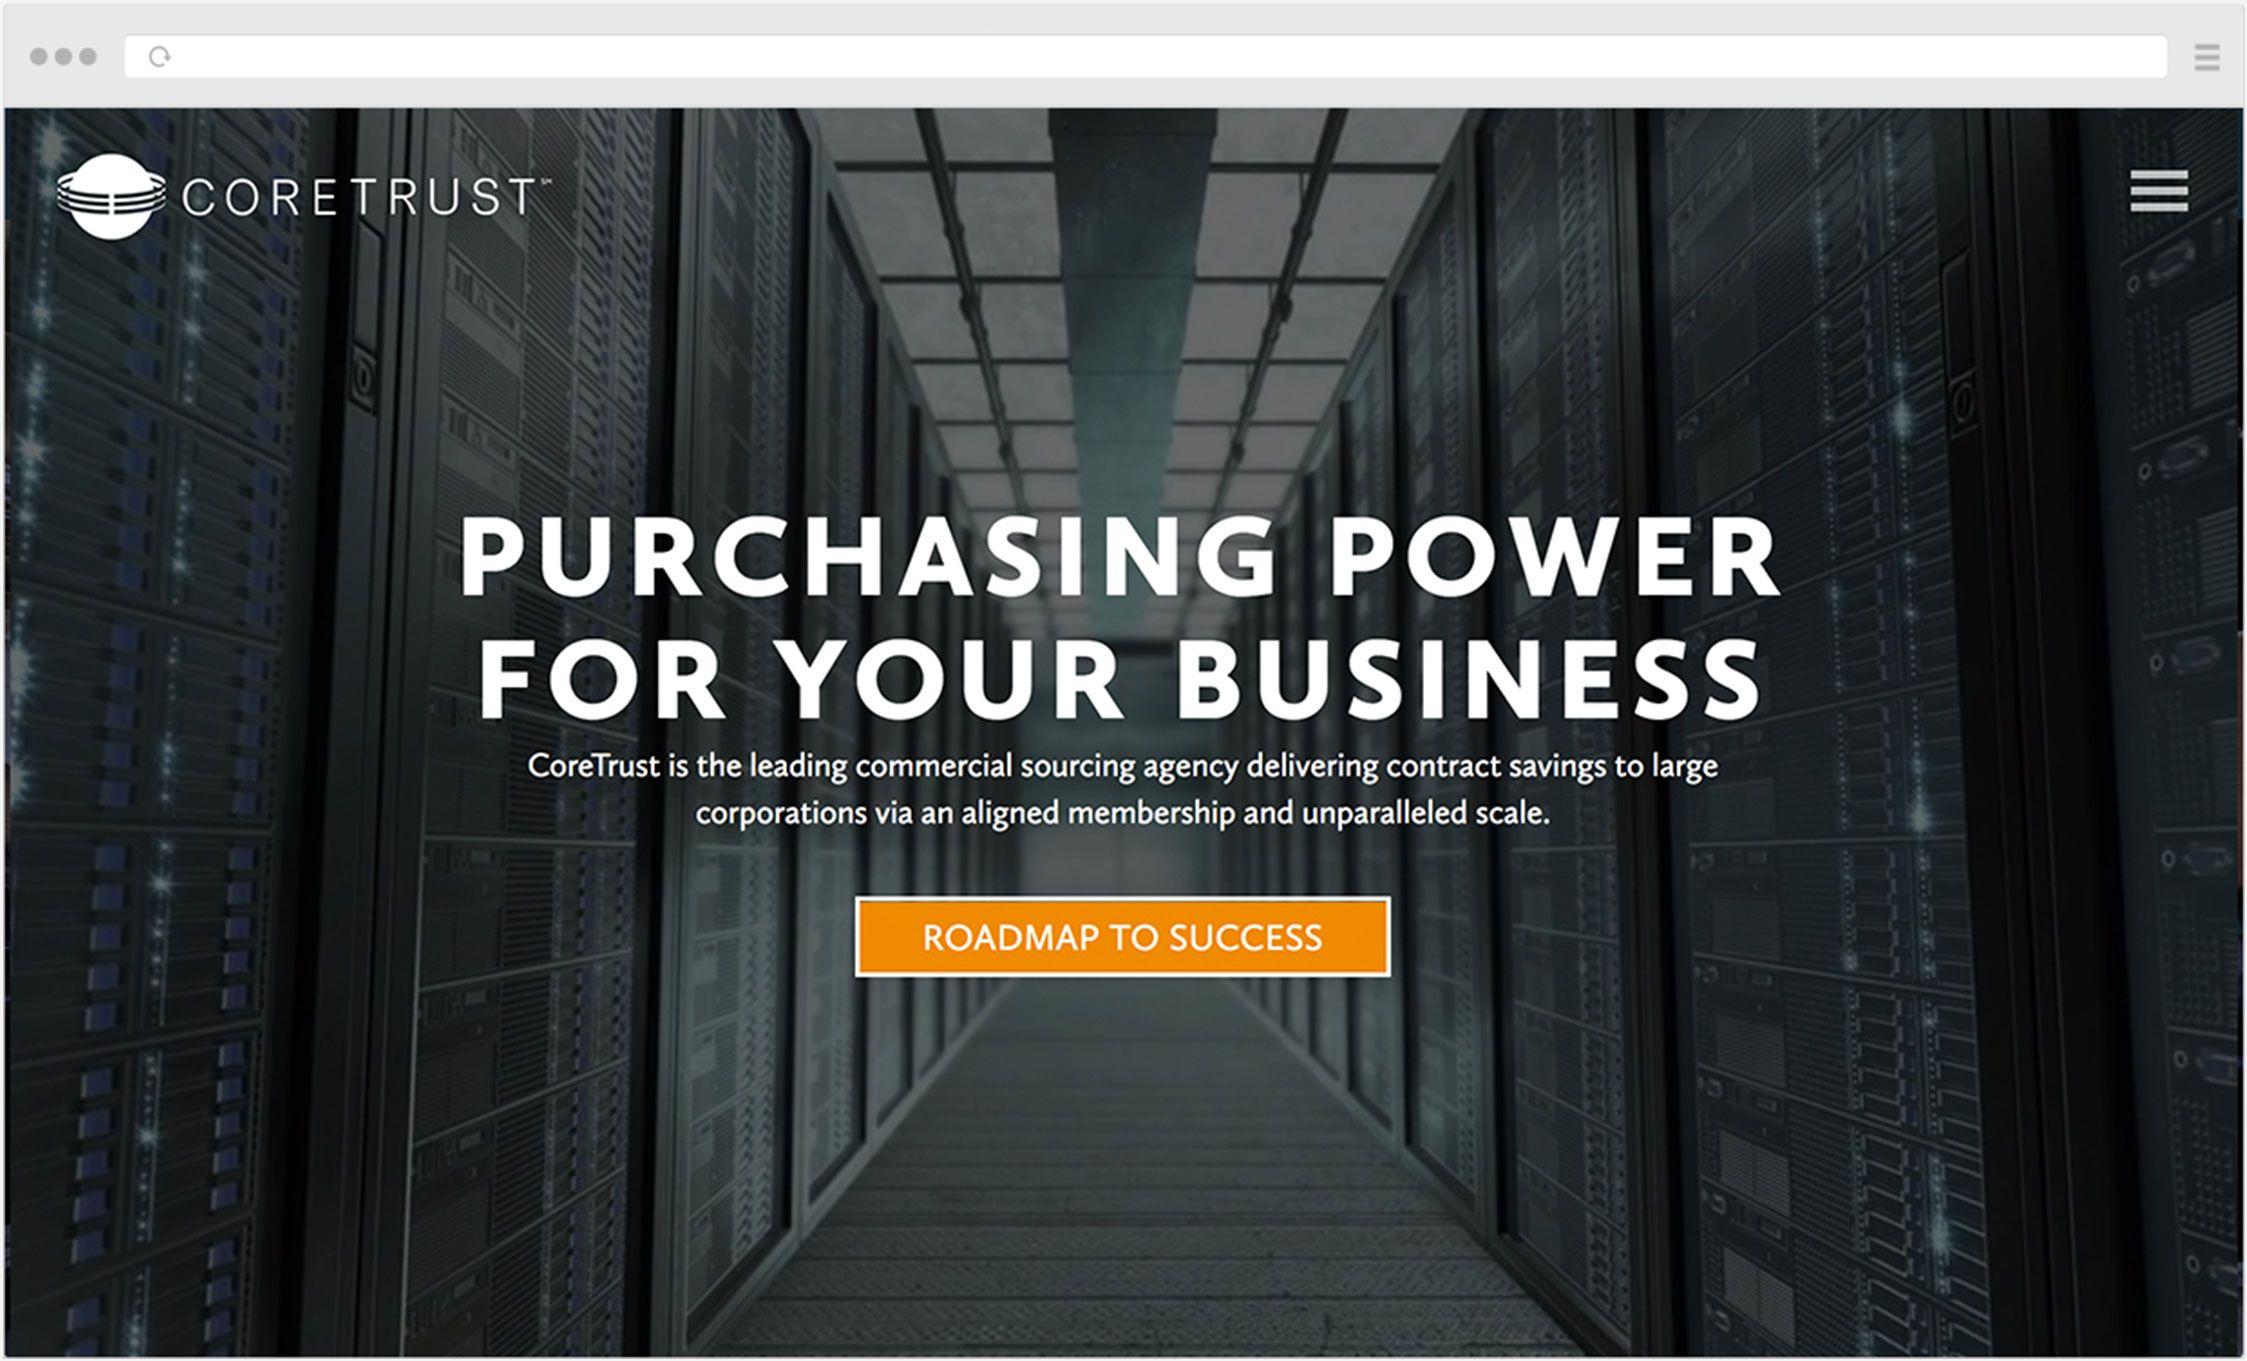 Coretrust Business Website Design Website Design Web Design Agency